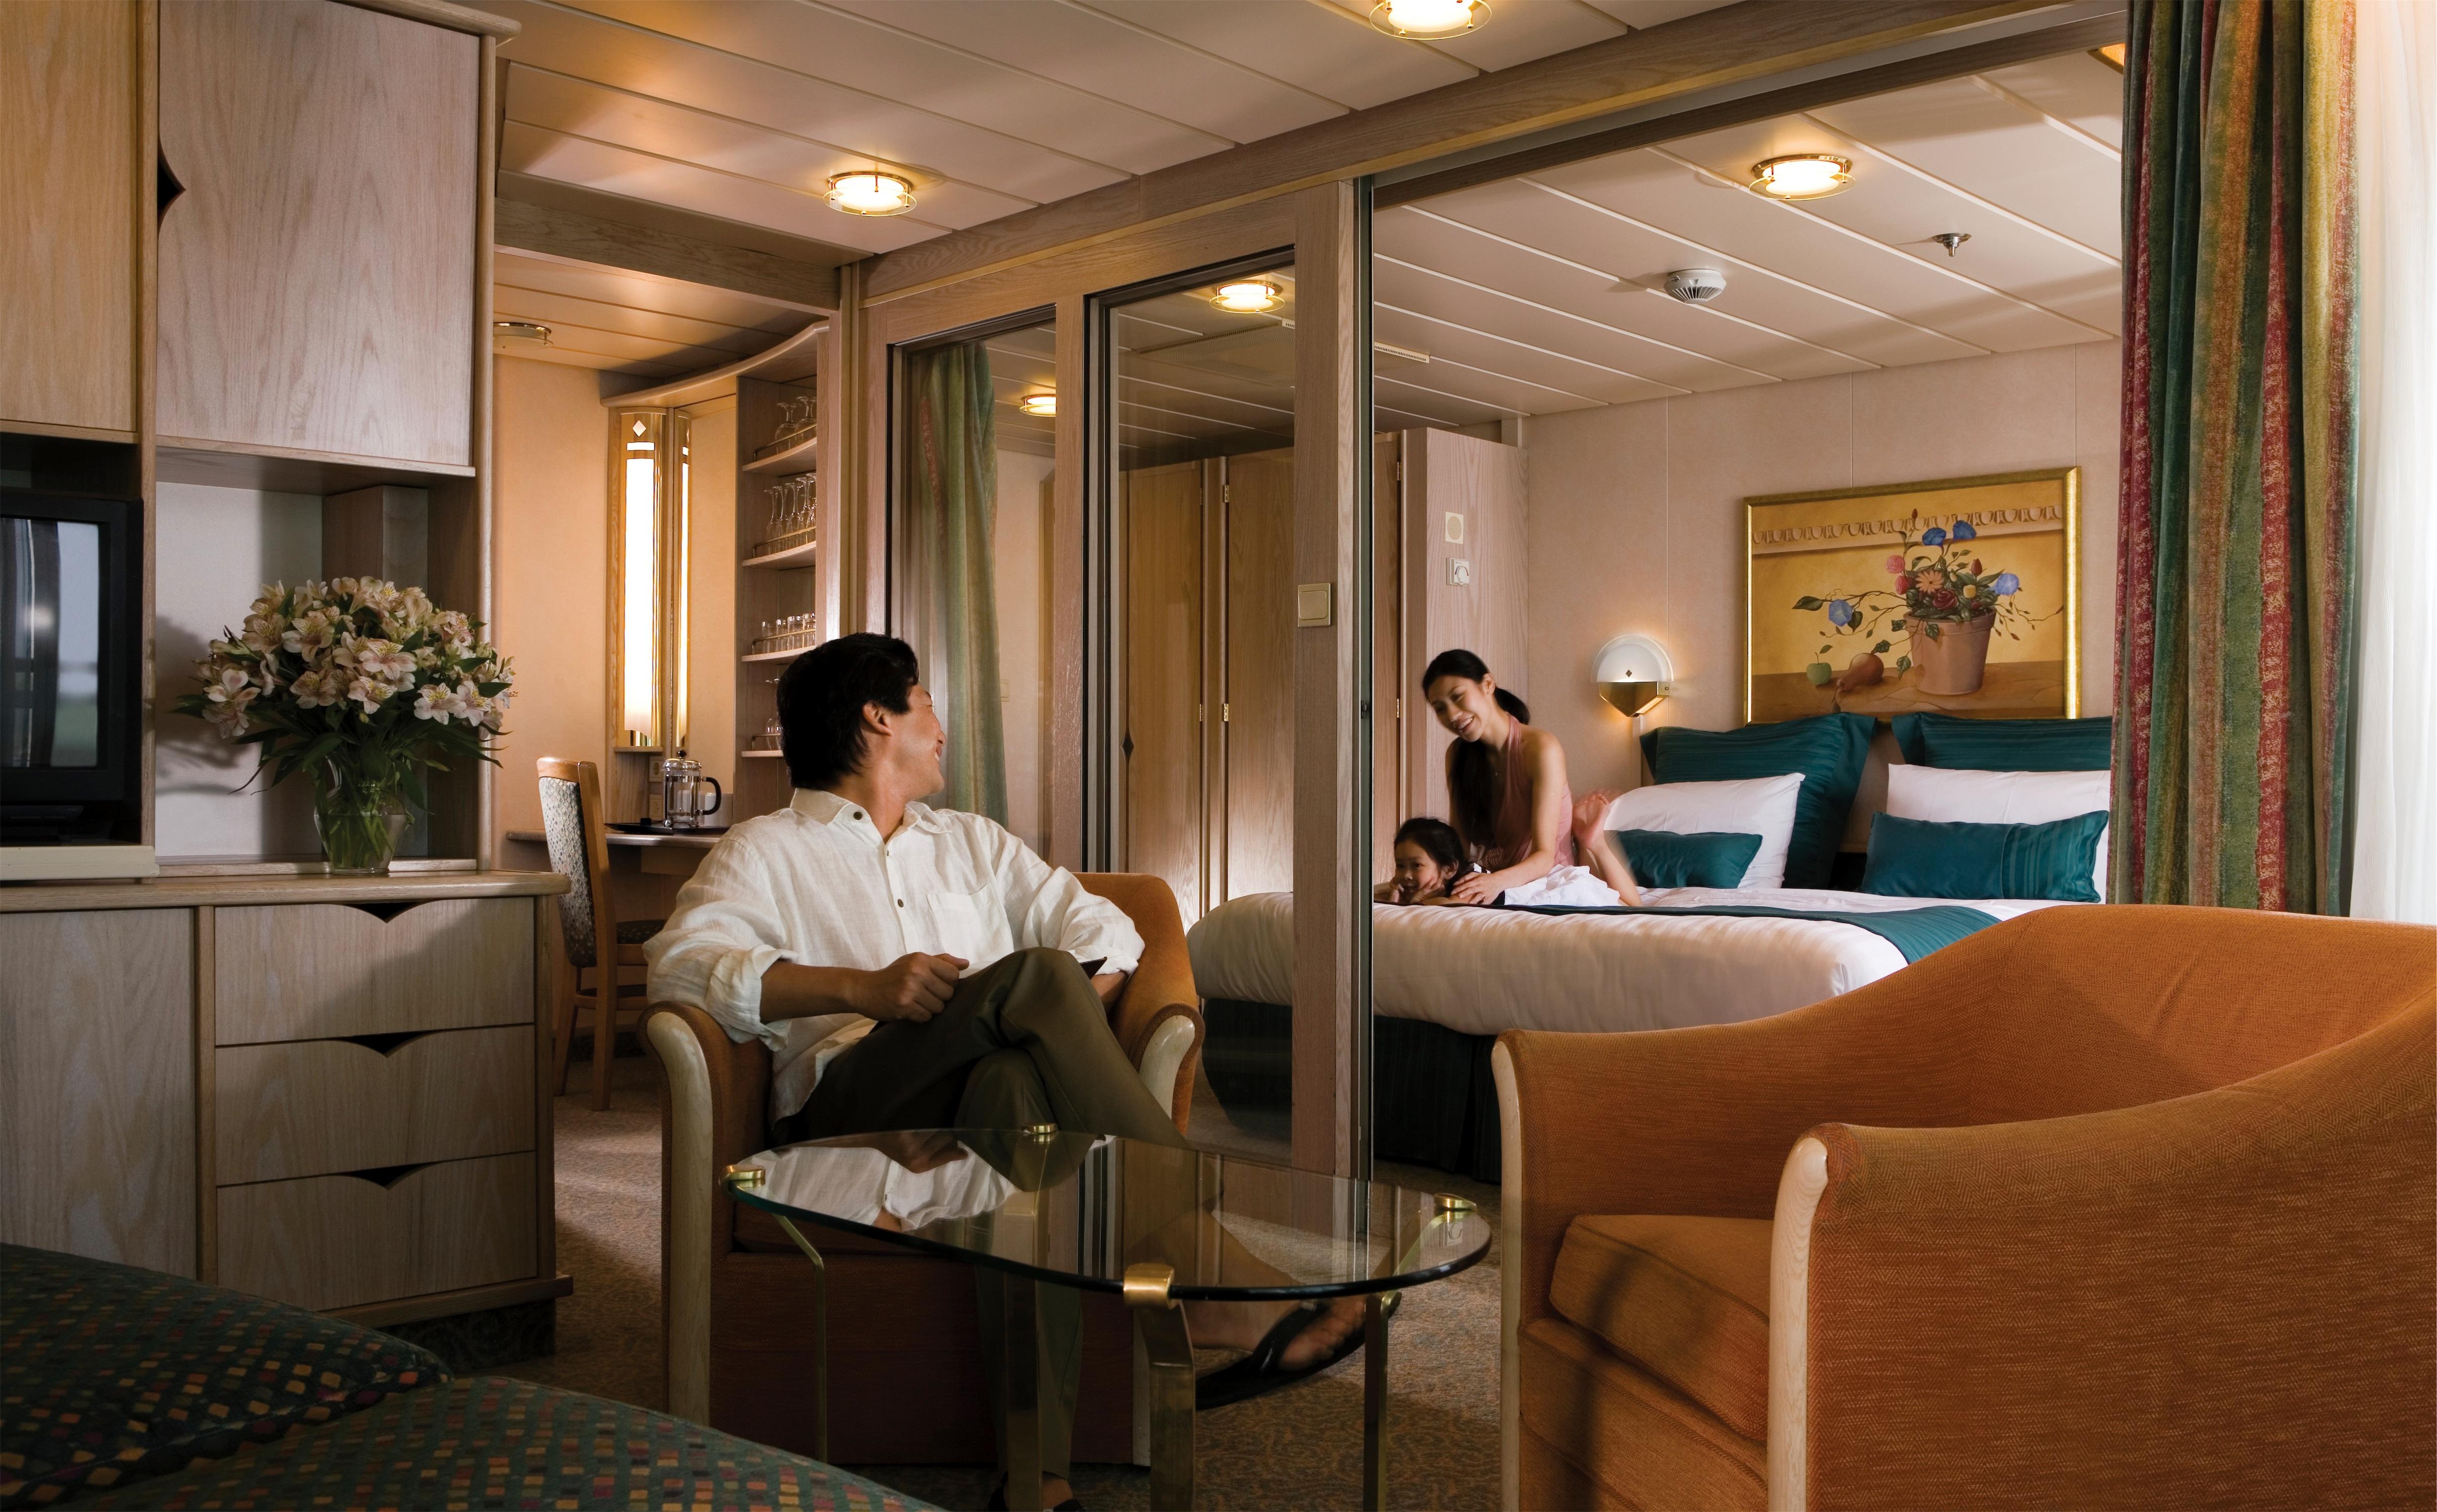 Royal Caribbean International Rhapsody of the Seas Accommodation Suite 1.jpg